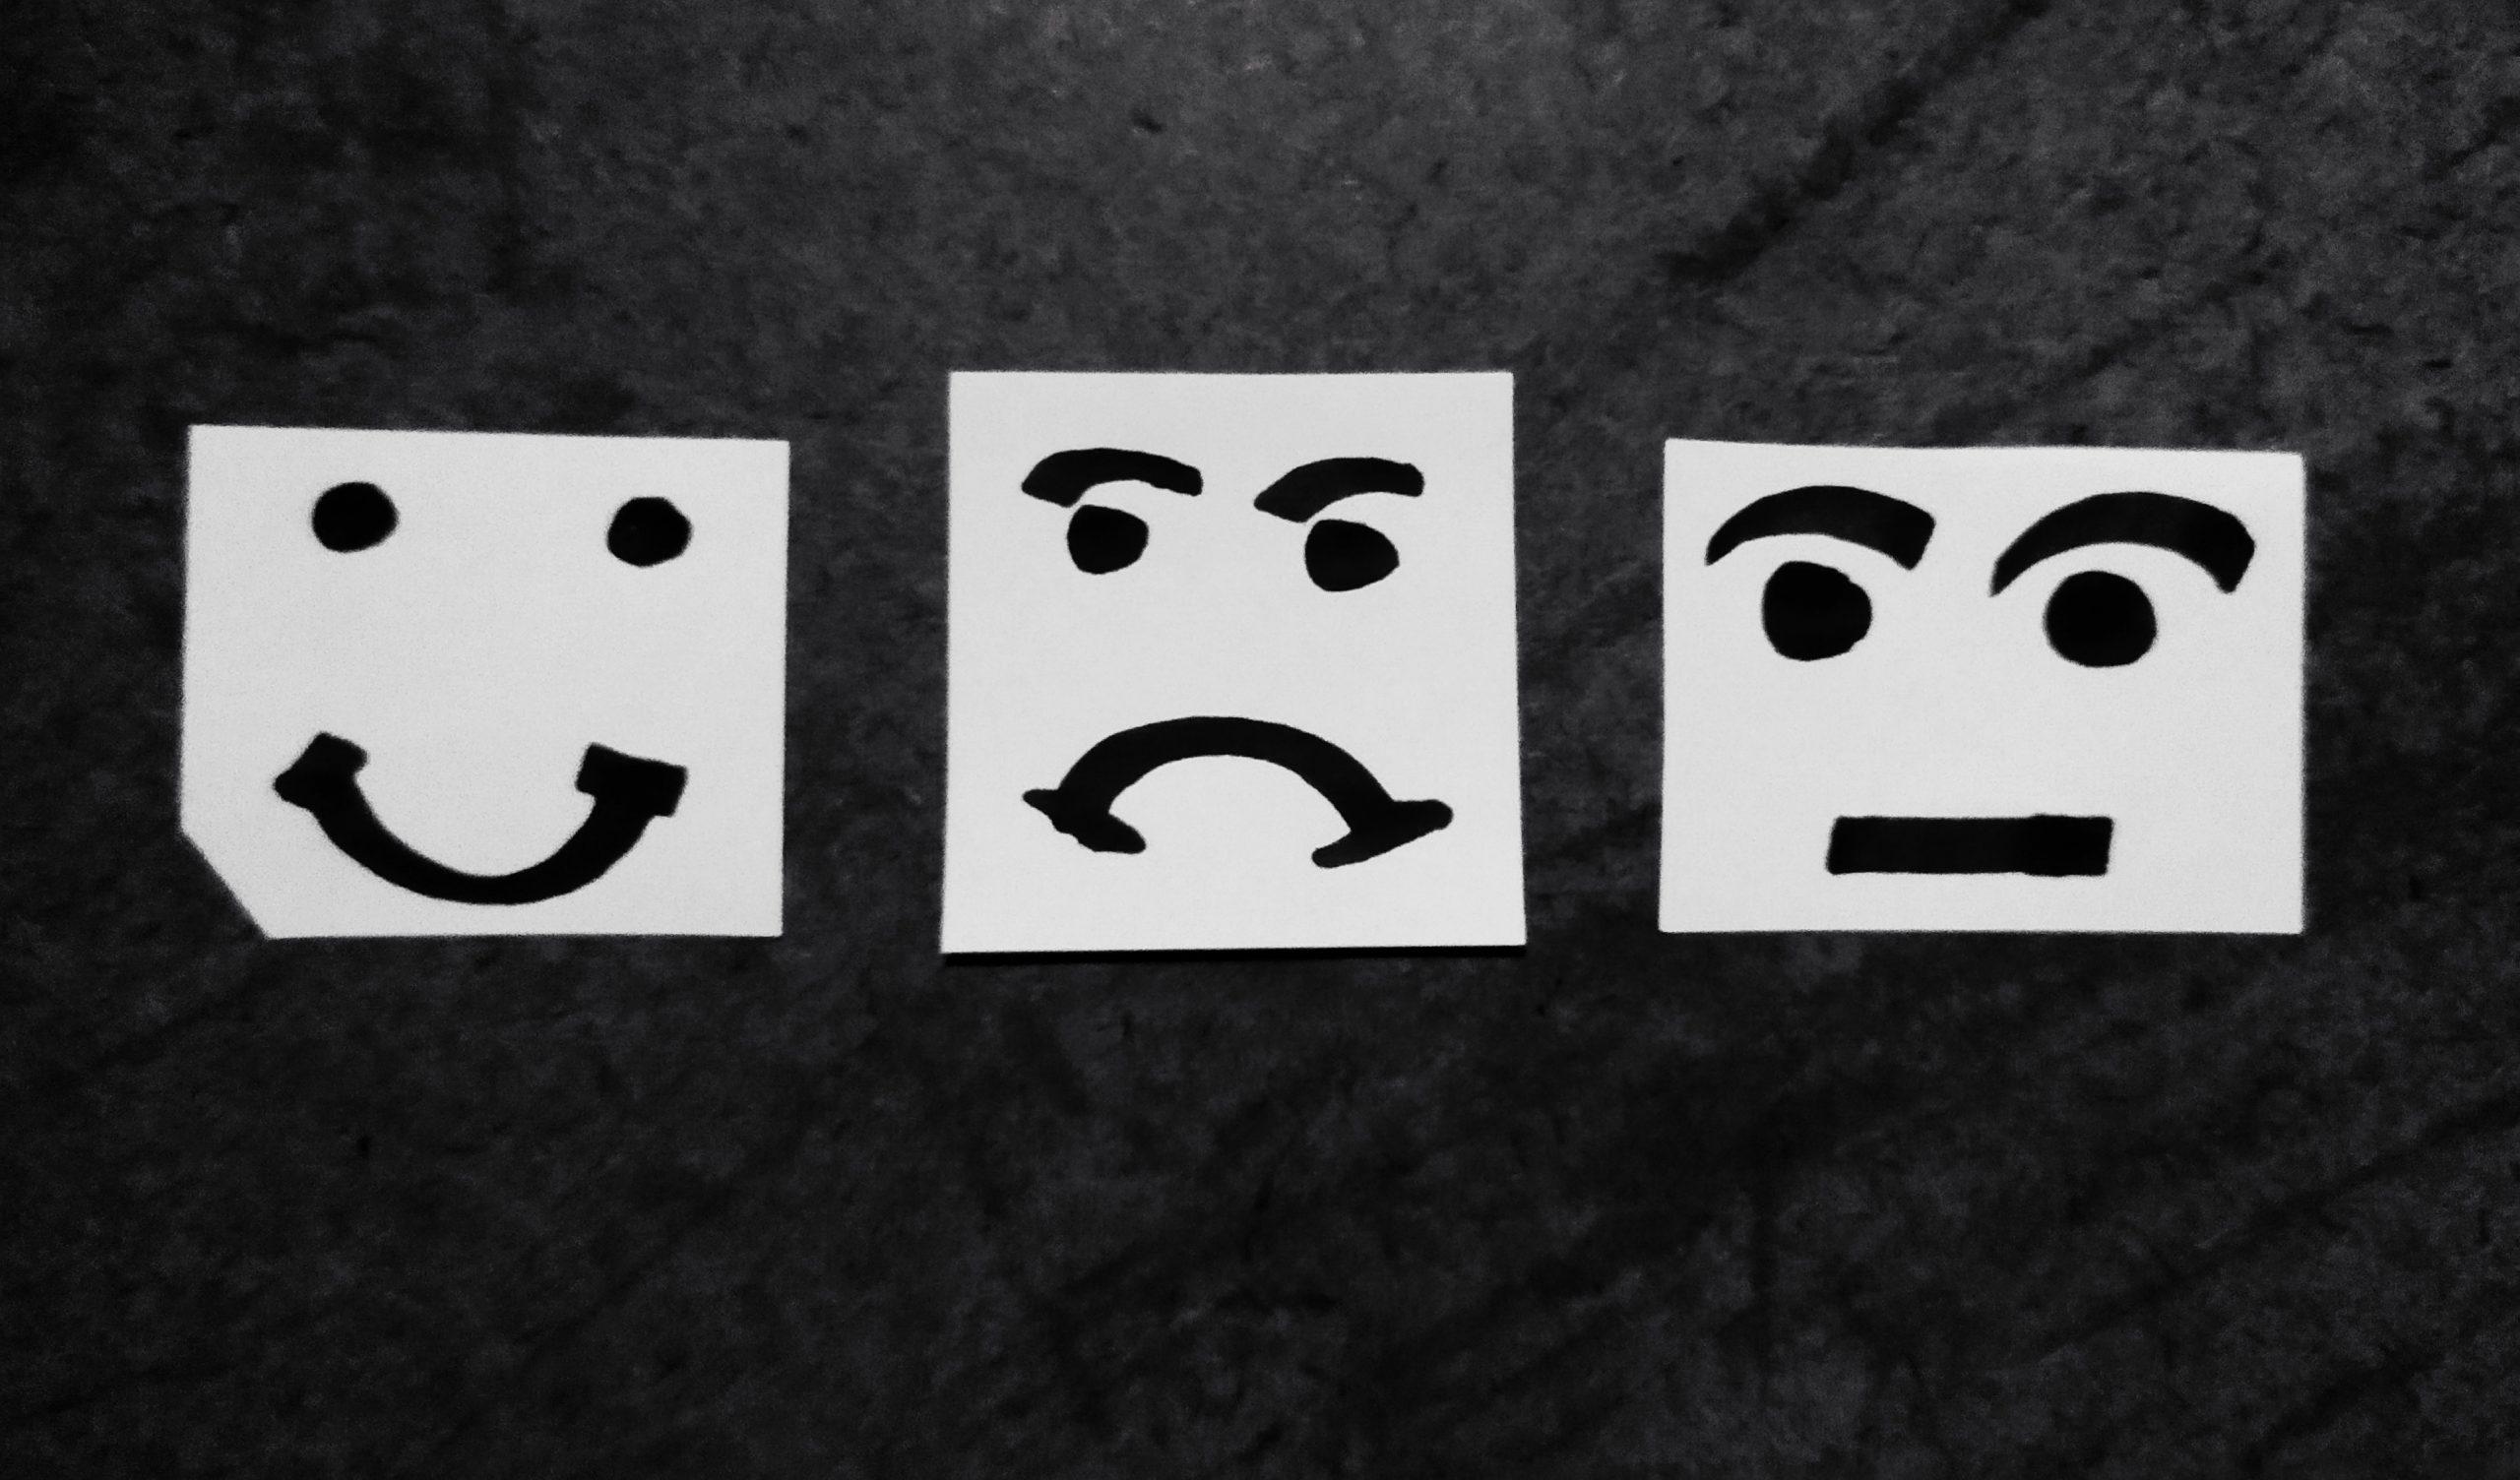 Customer feedback faces